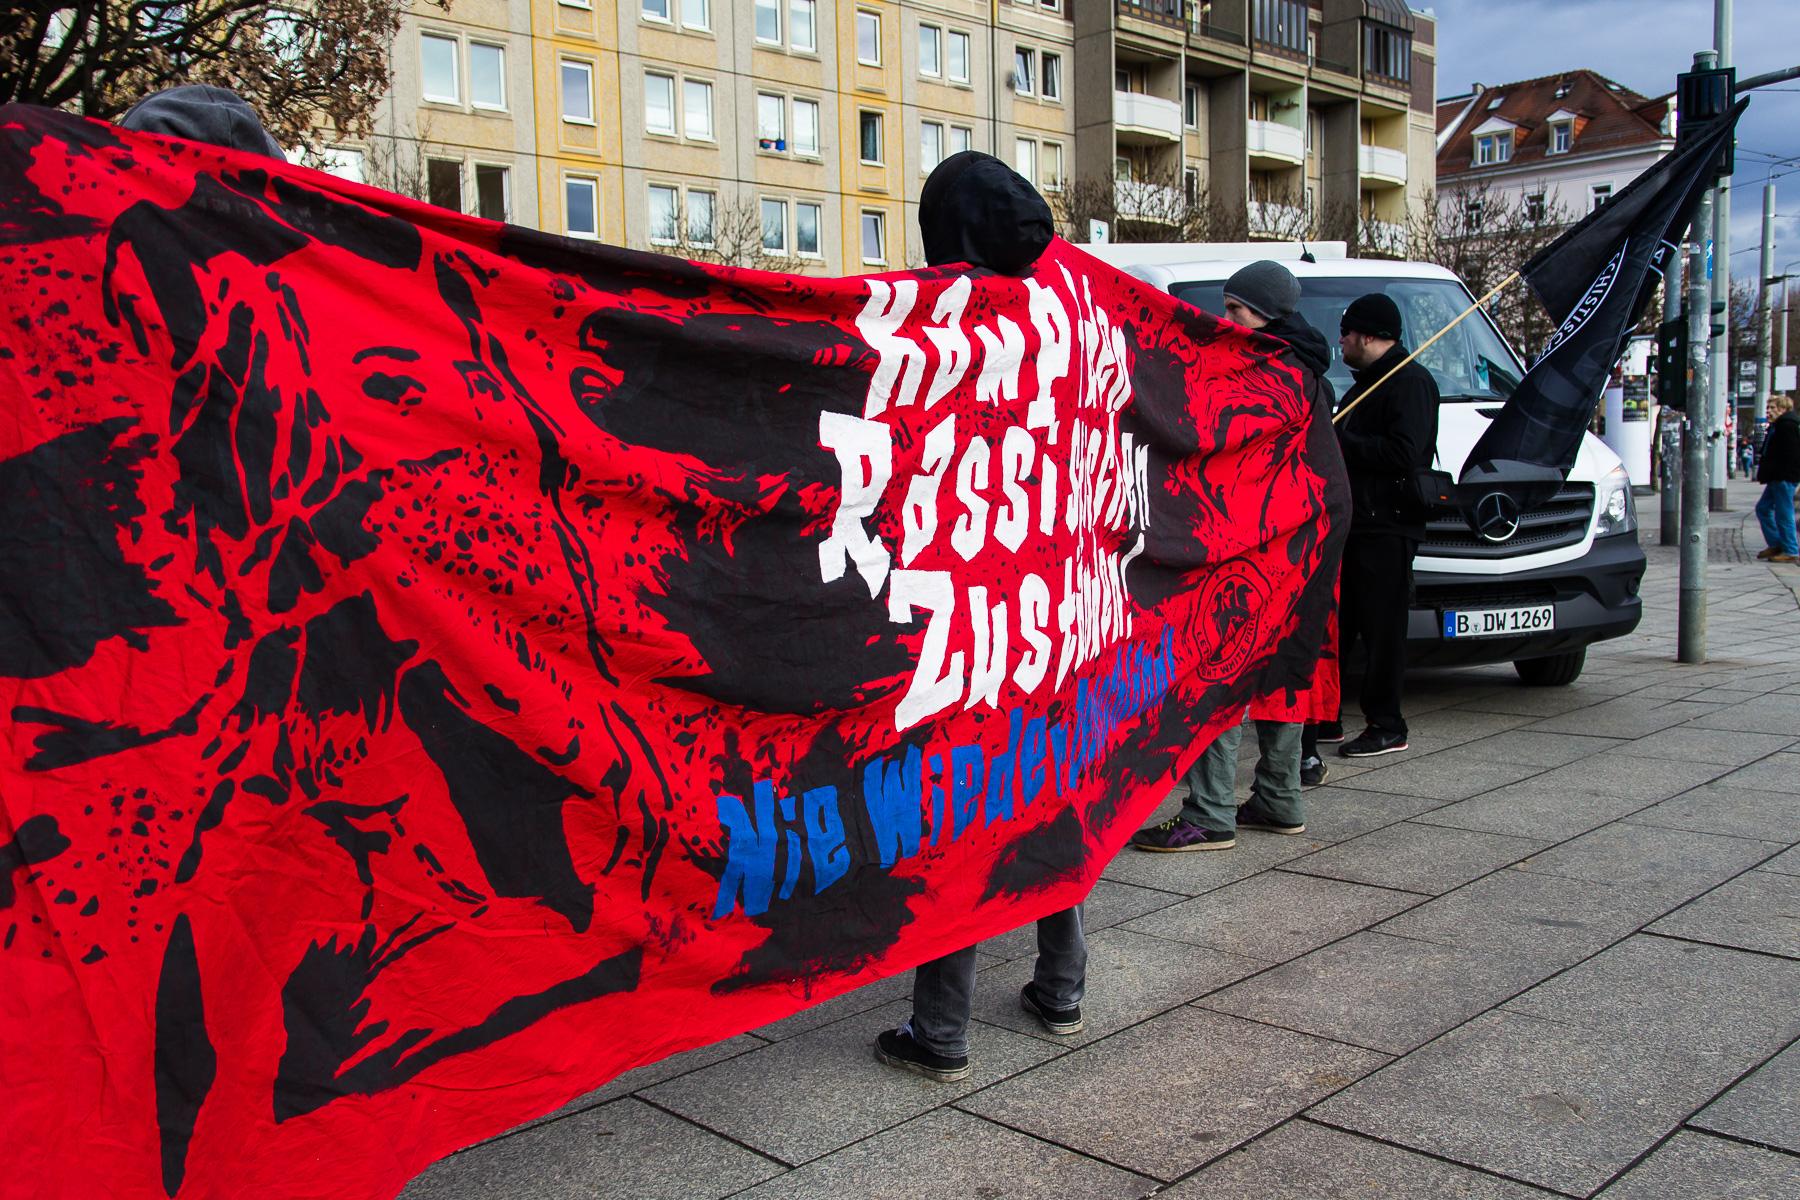 Stadtteilspaziergang gegen rechte Angriffe und Rassismus